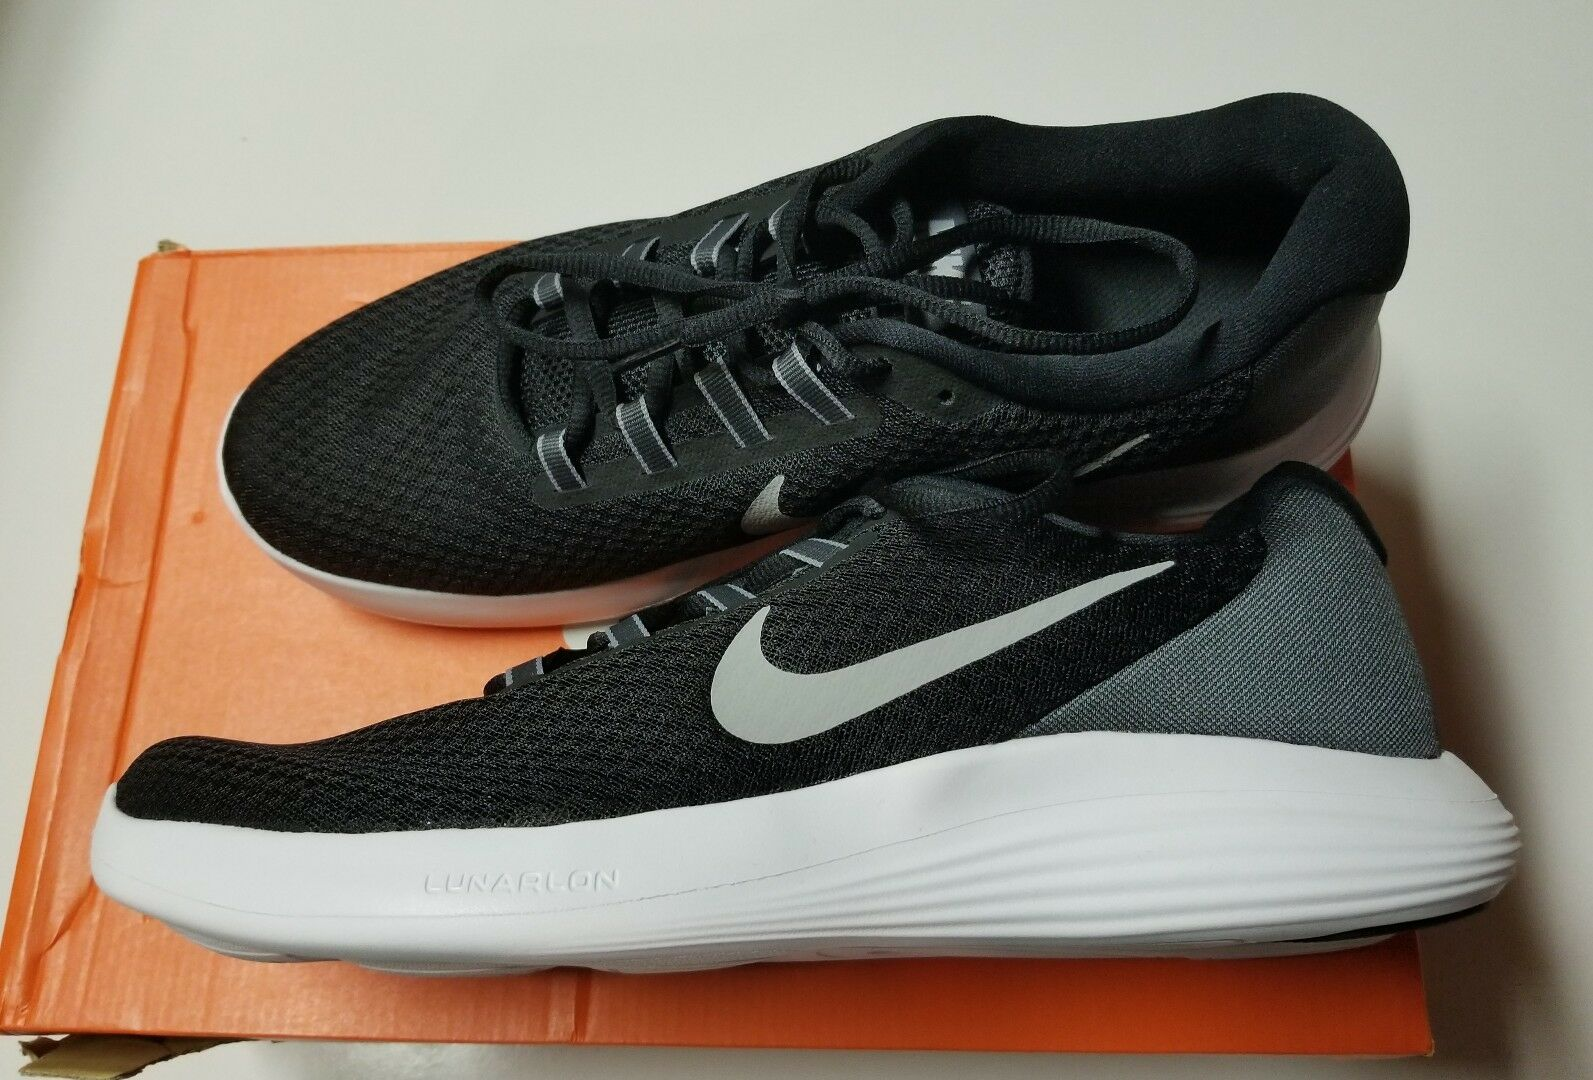 Nike Lunar Converge Men's Running shoes